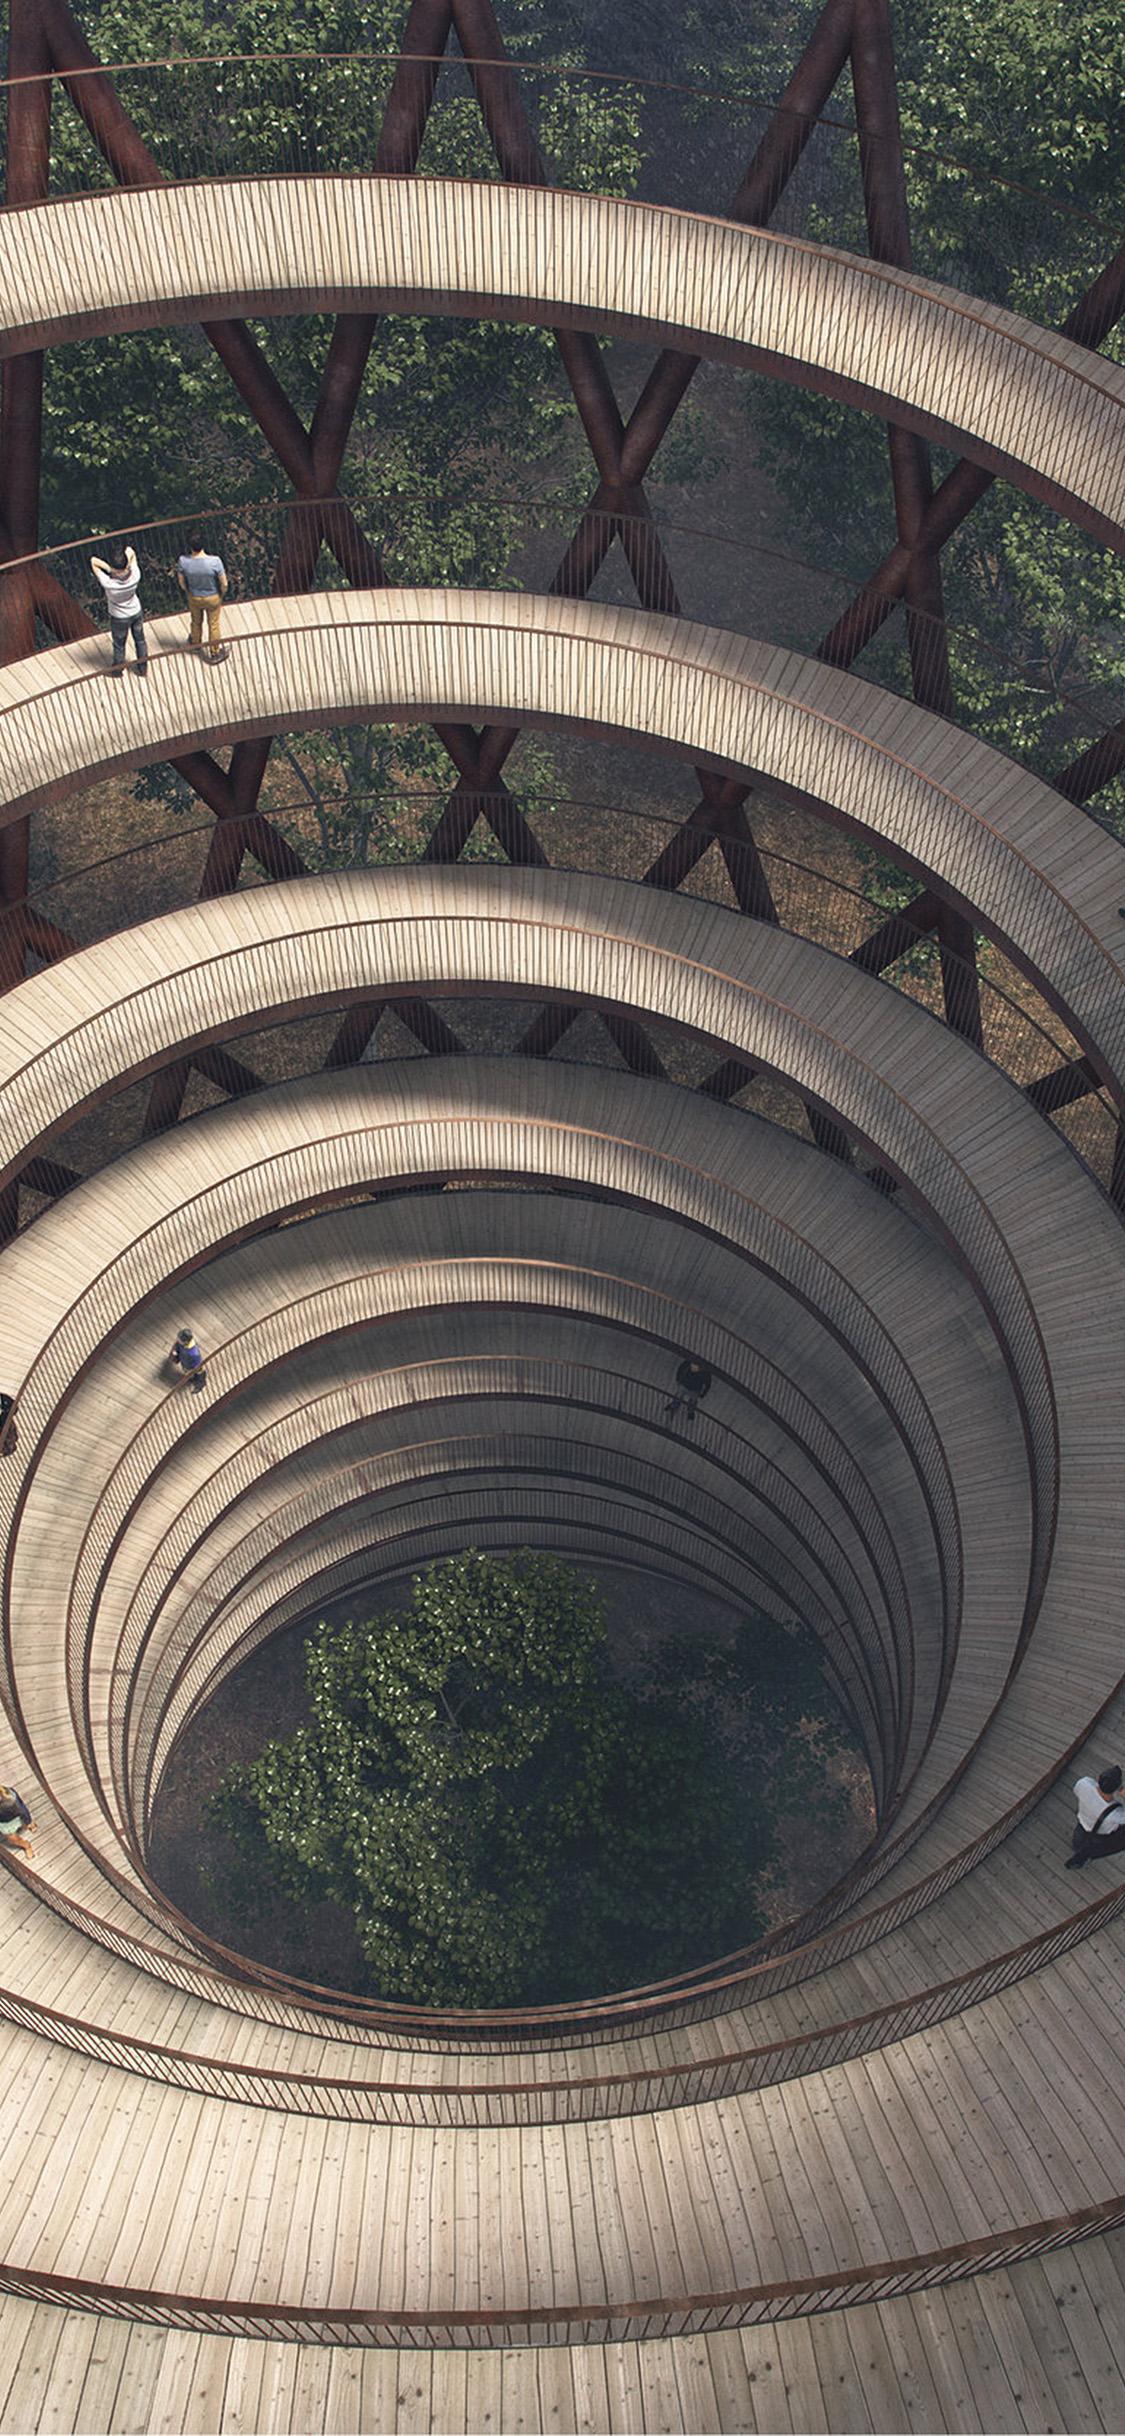 iPhonexpapers.com-Apple-iPhone-wallpaper-oa69-architecture-circle-nature